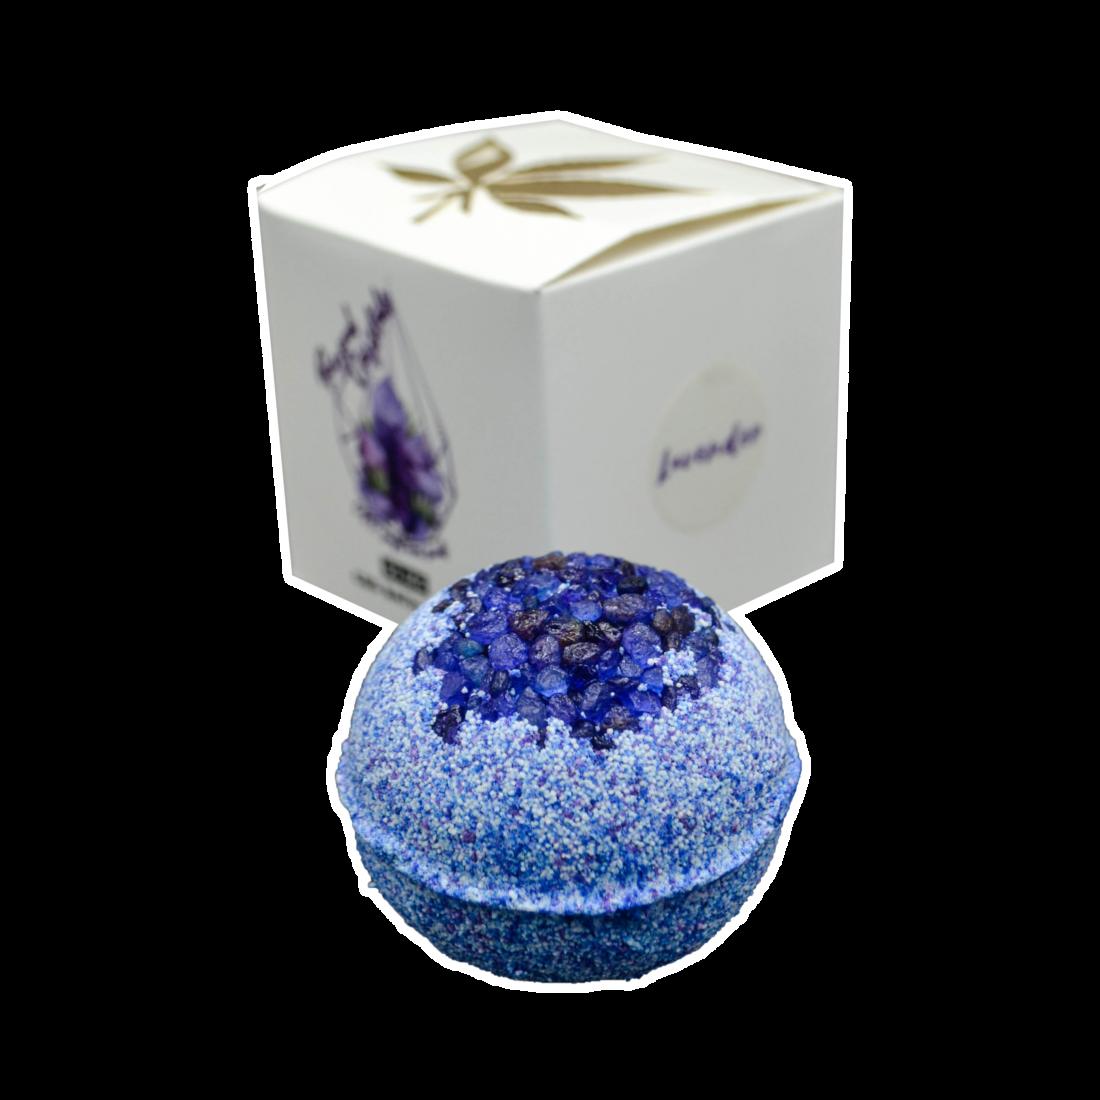 CBD Livity - Lavender bath bomb